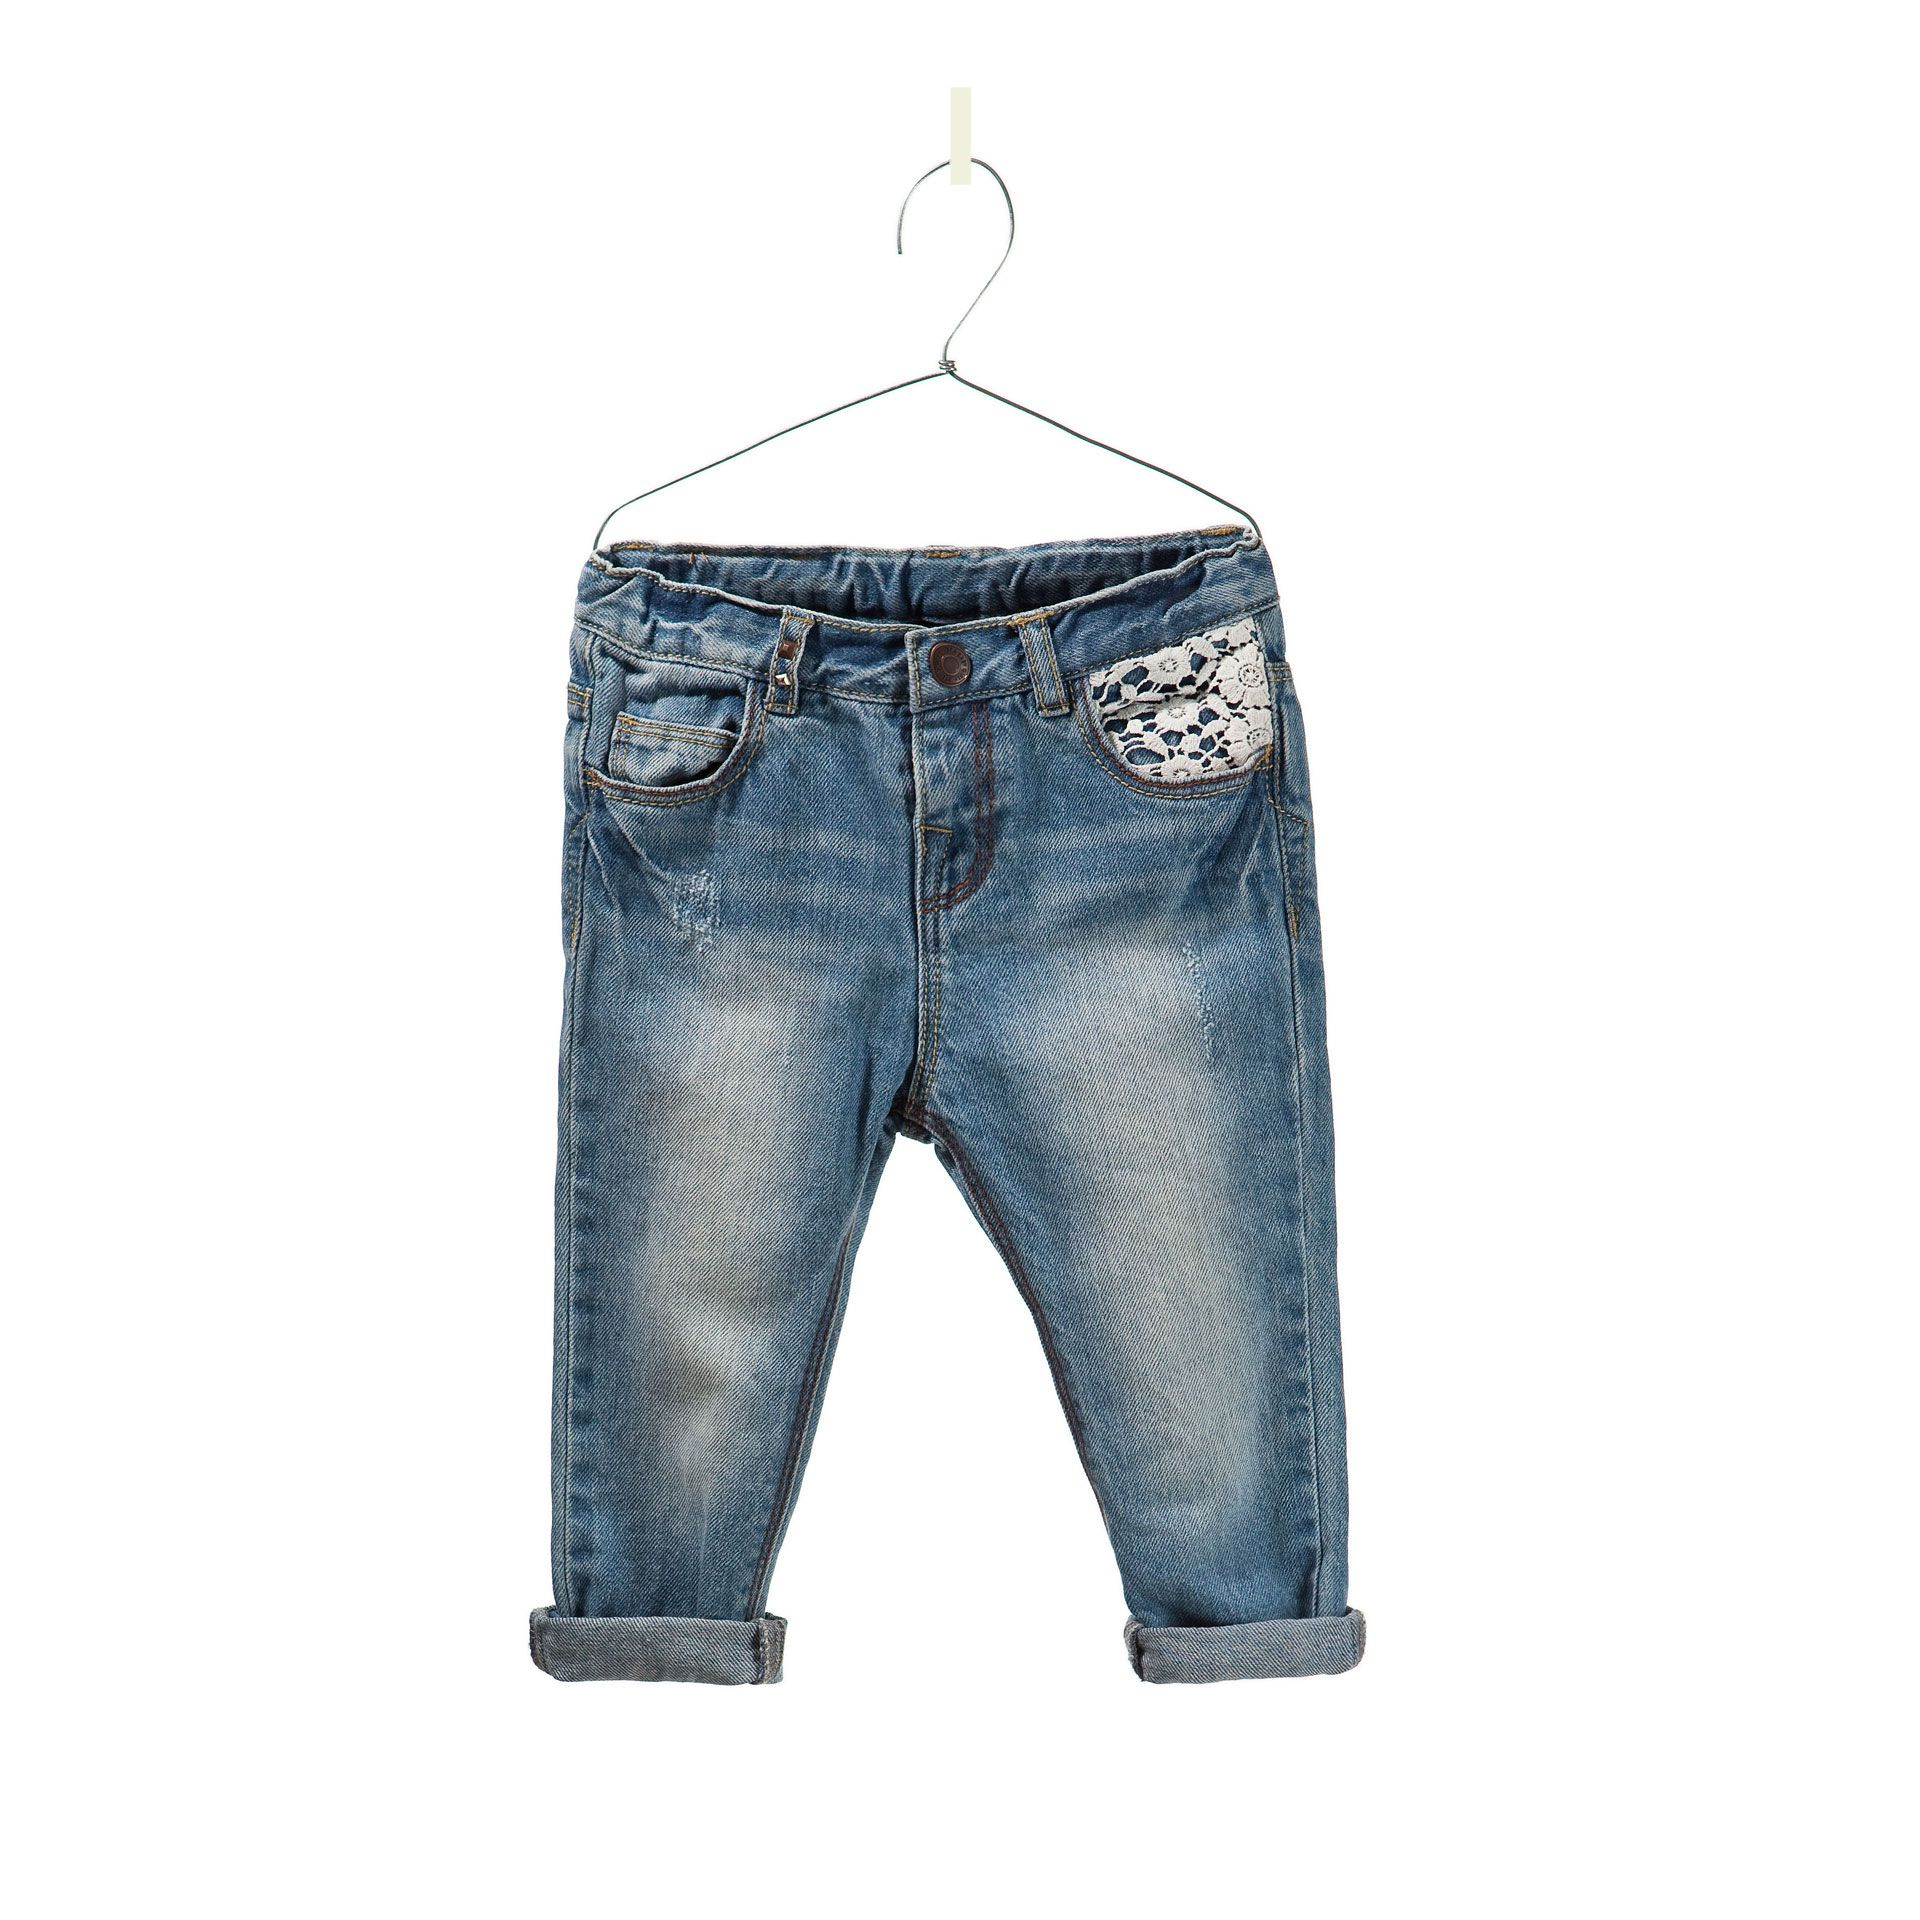 50e815551 jeans bordado - Pantalones y faldas - Bebé niña - Niños - ZARA ...